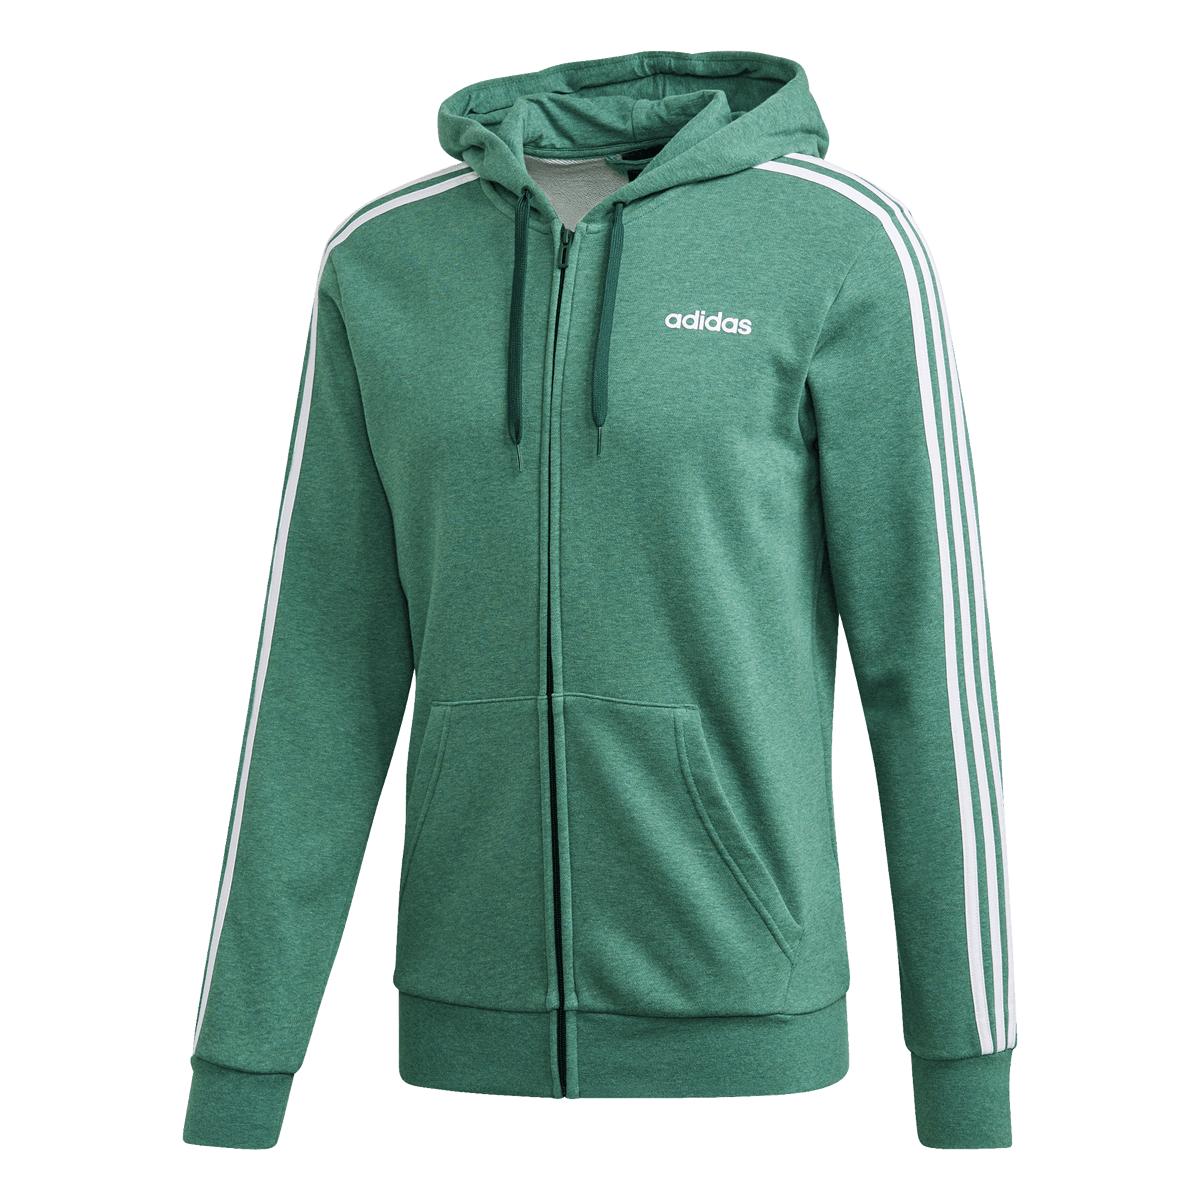 adidas Essentials 3S FZ Kapuzenjacke in grün / weiß (Gr. S - XXL)